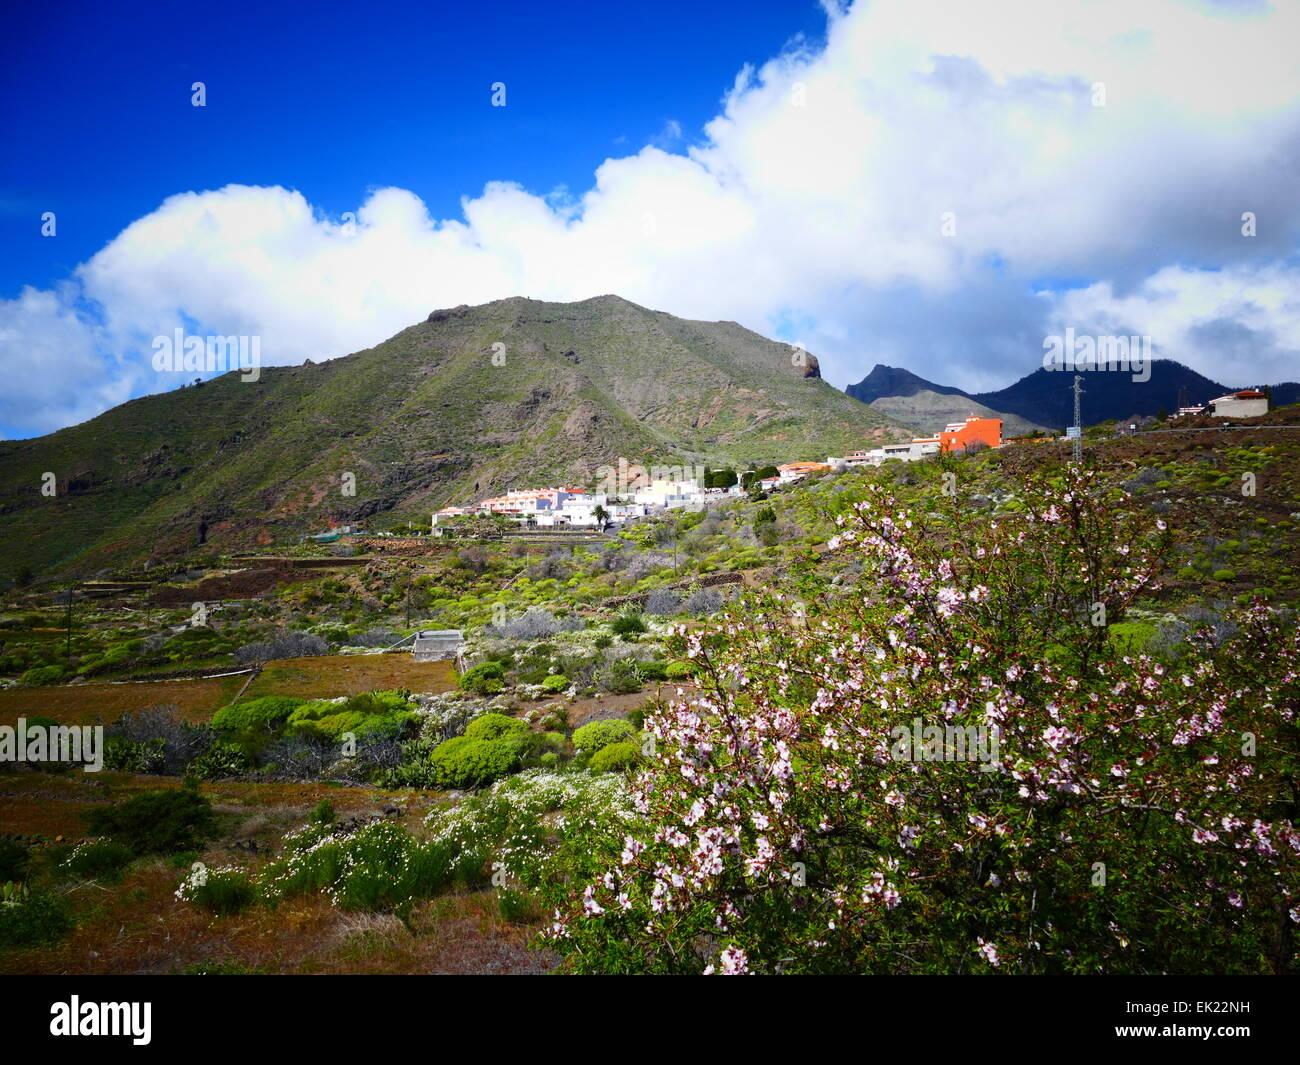 Cherry Blossom-Landschaft bei Santiago del Teide Teneriffa Insel Kanaren Spanien Stockbild